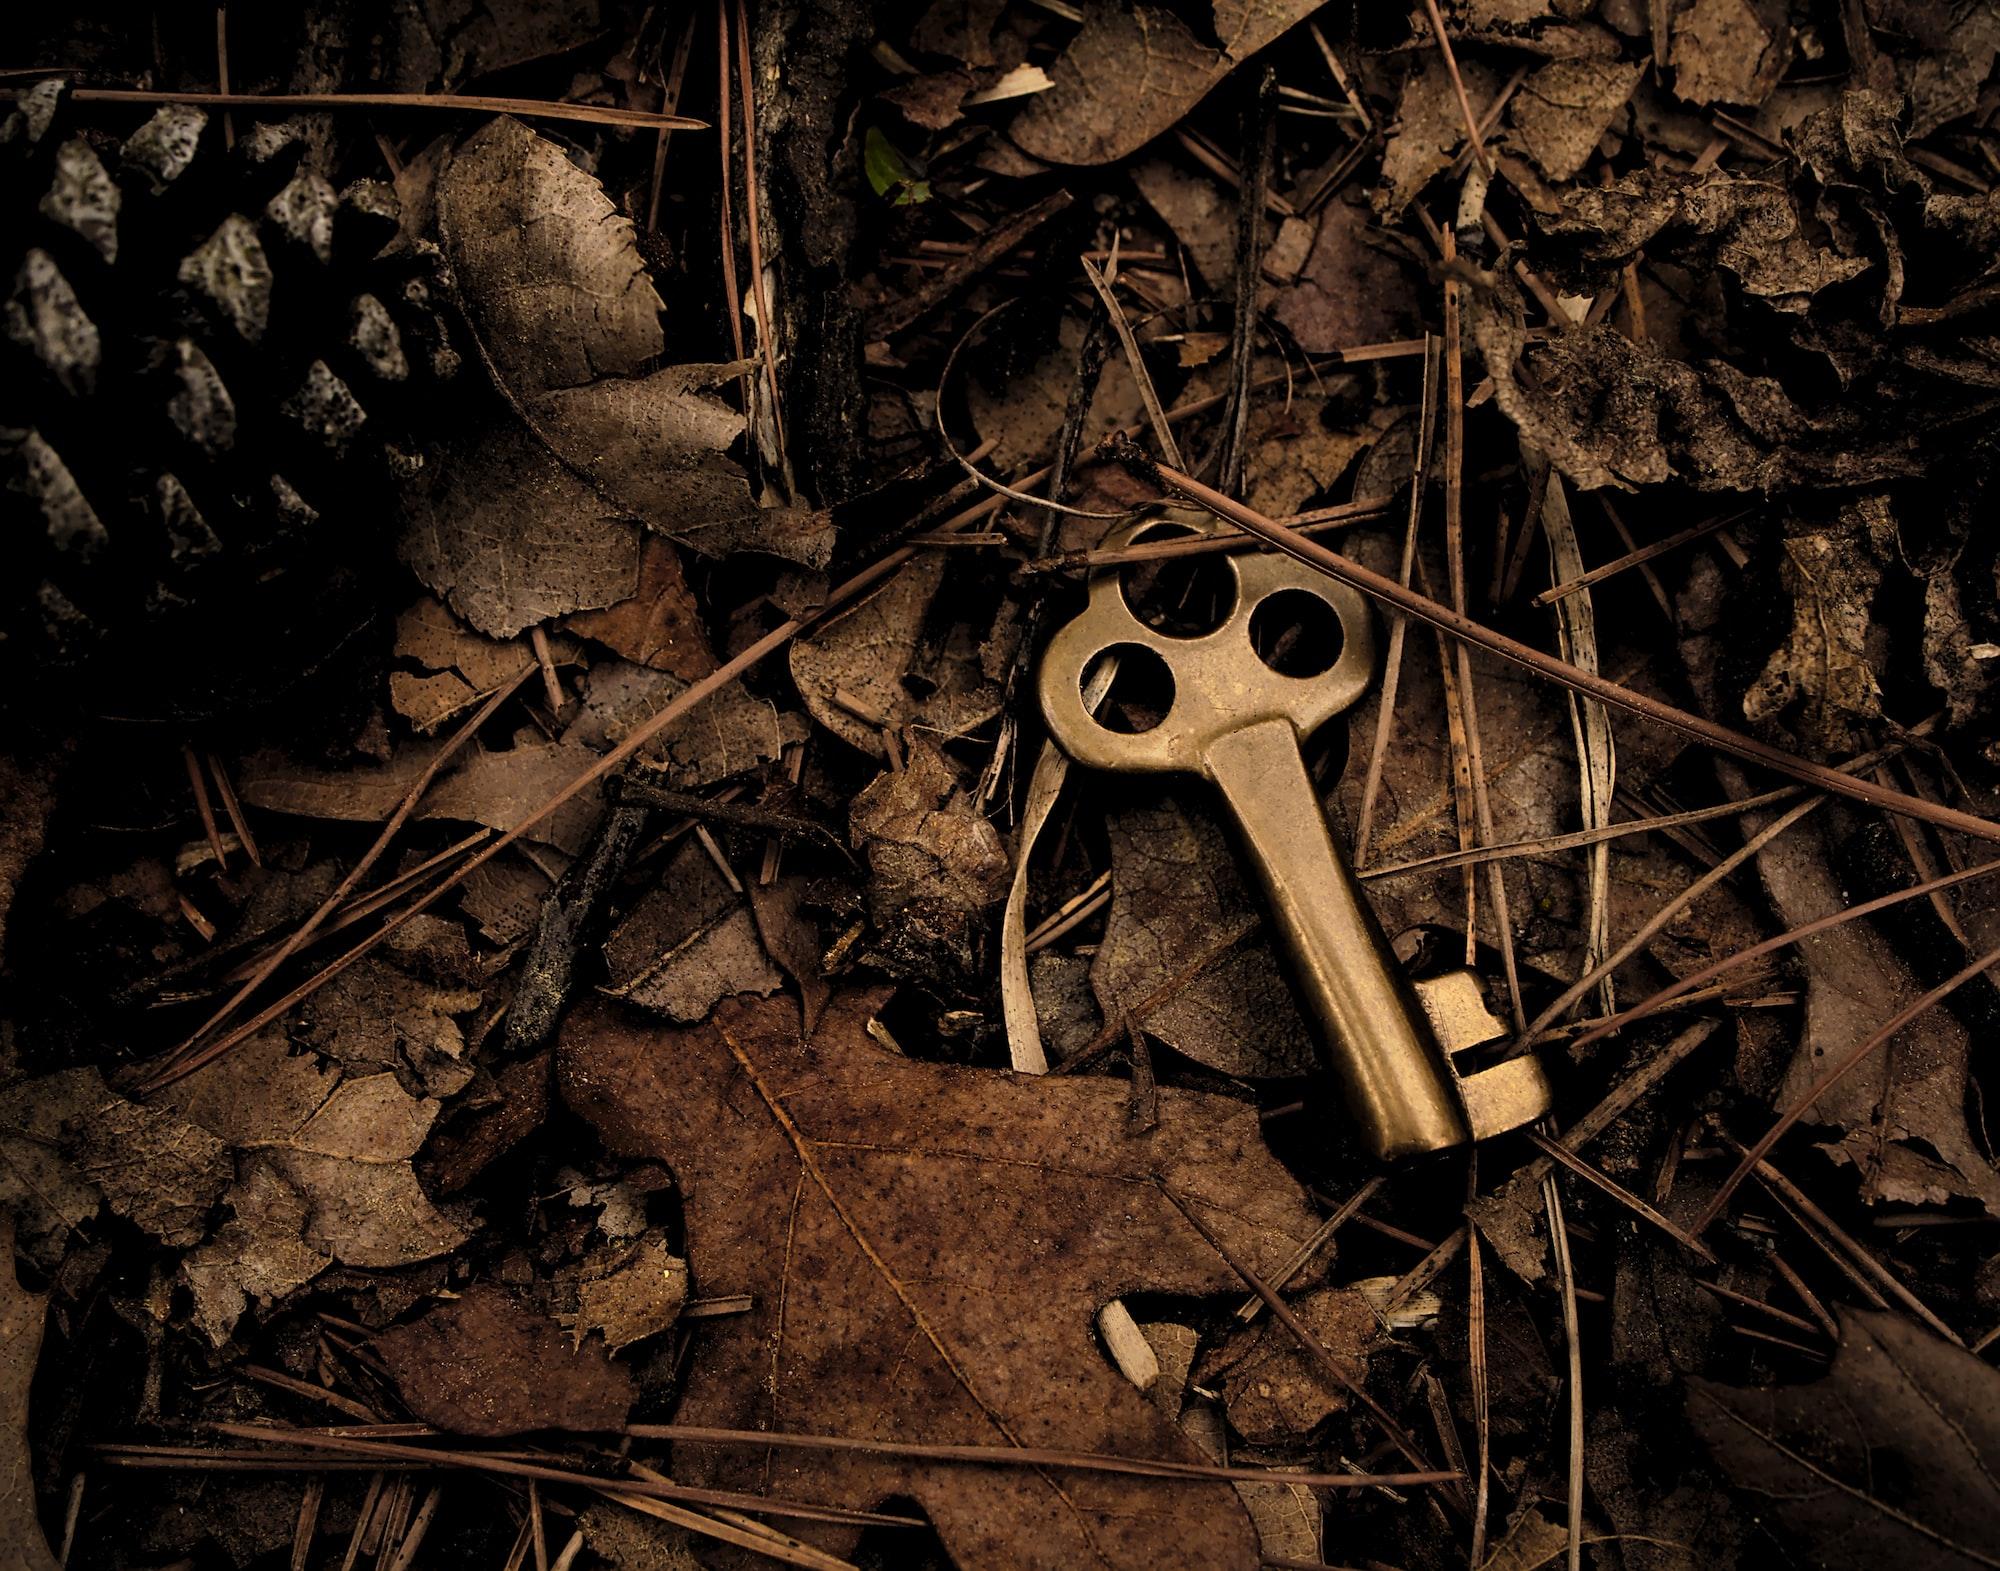 Bodies and Buried Treasure